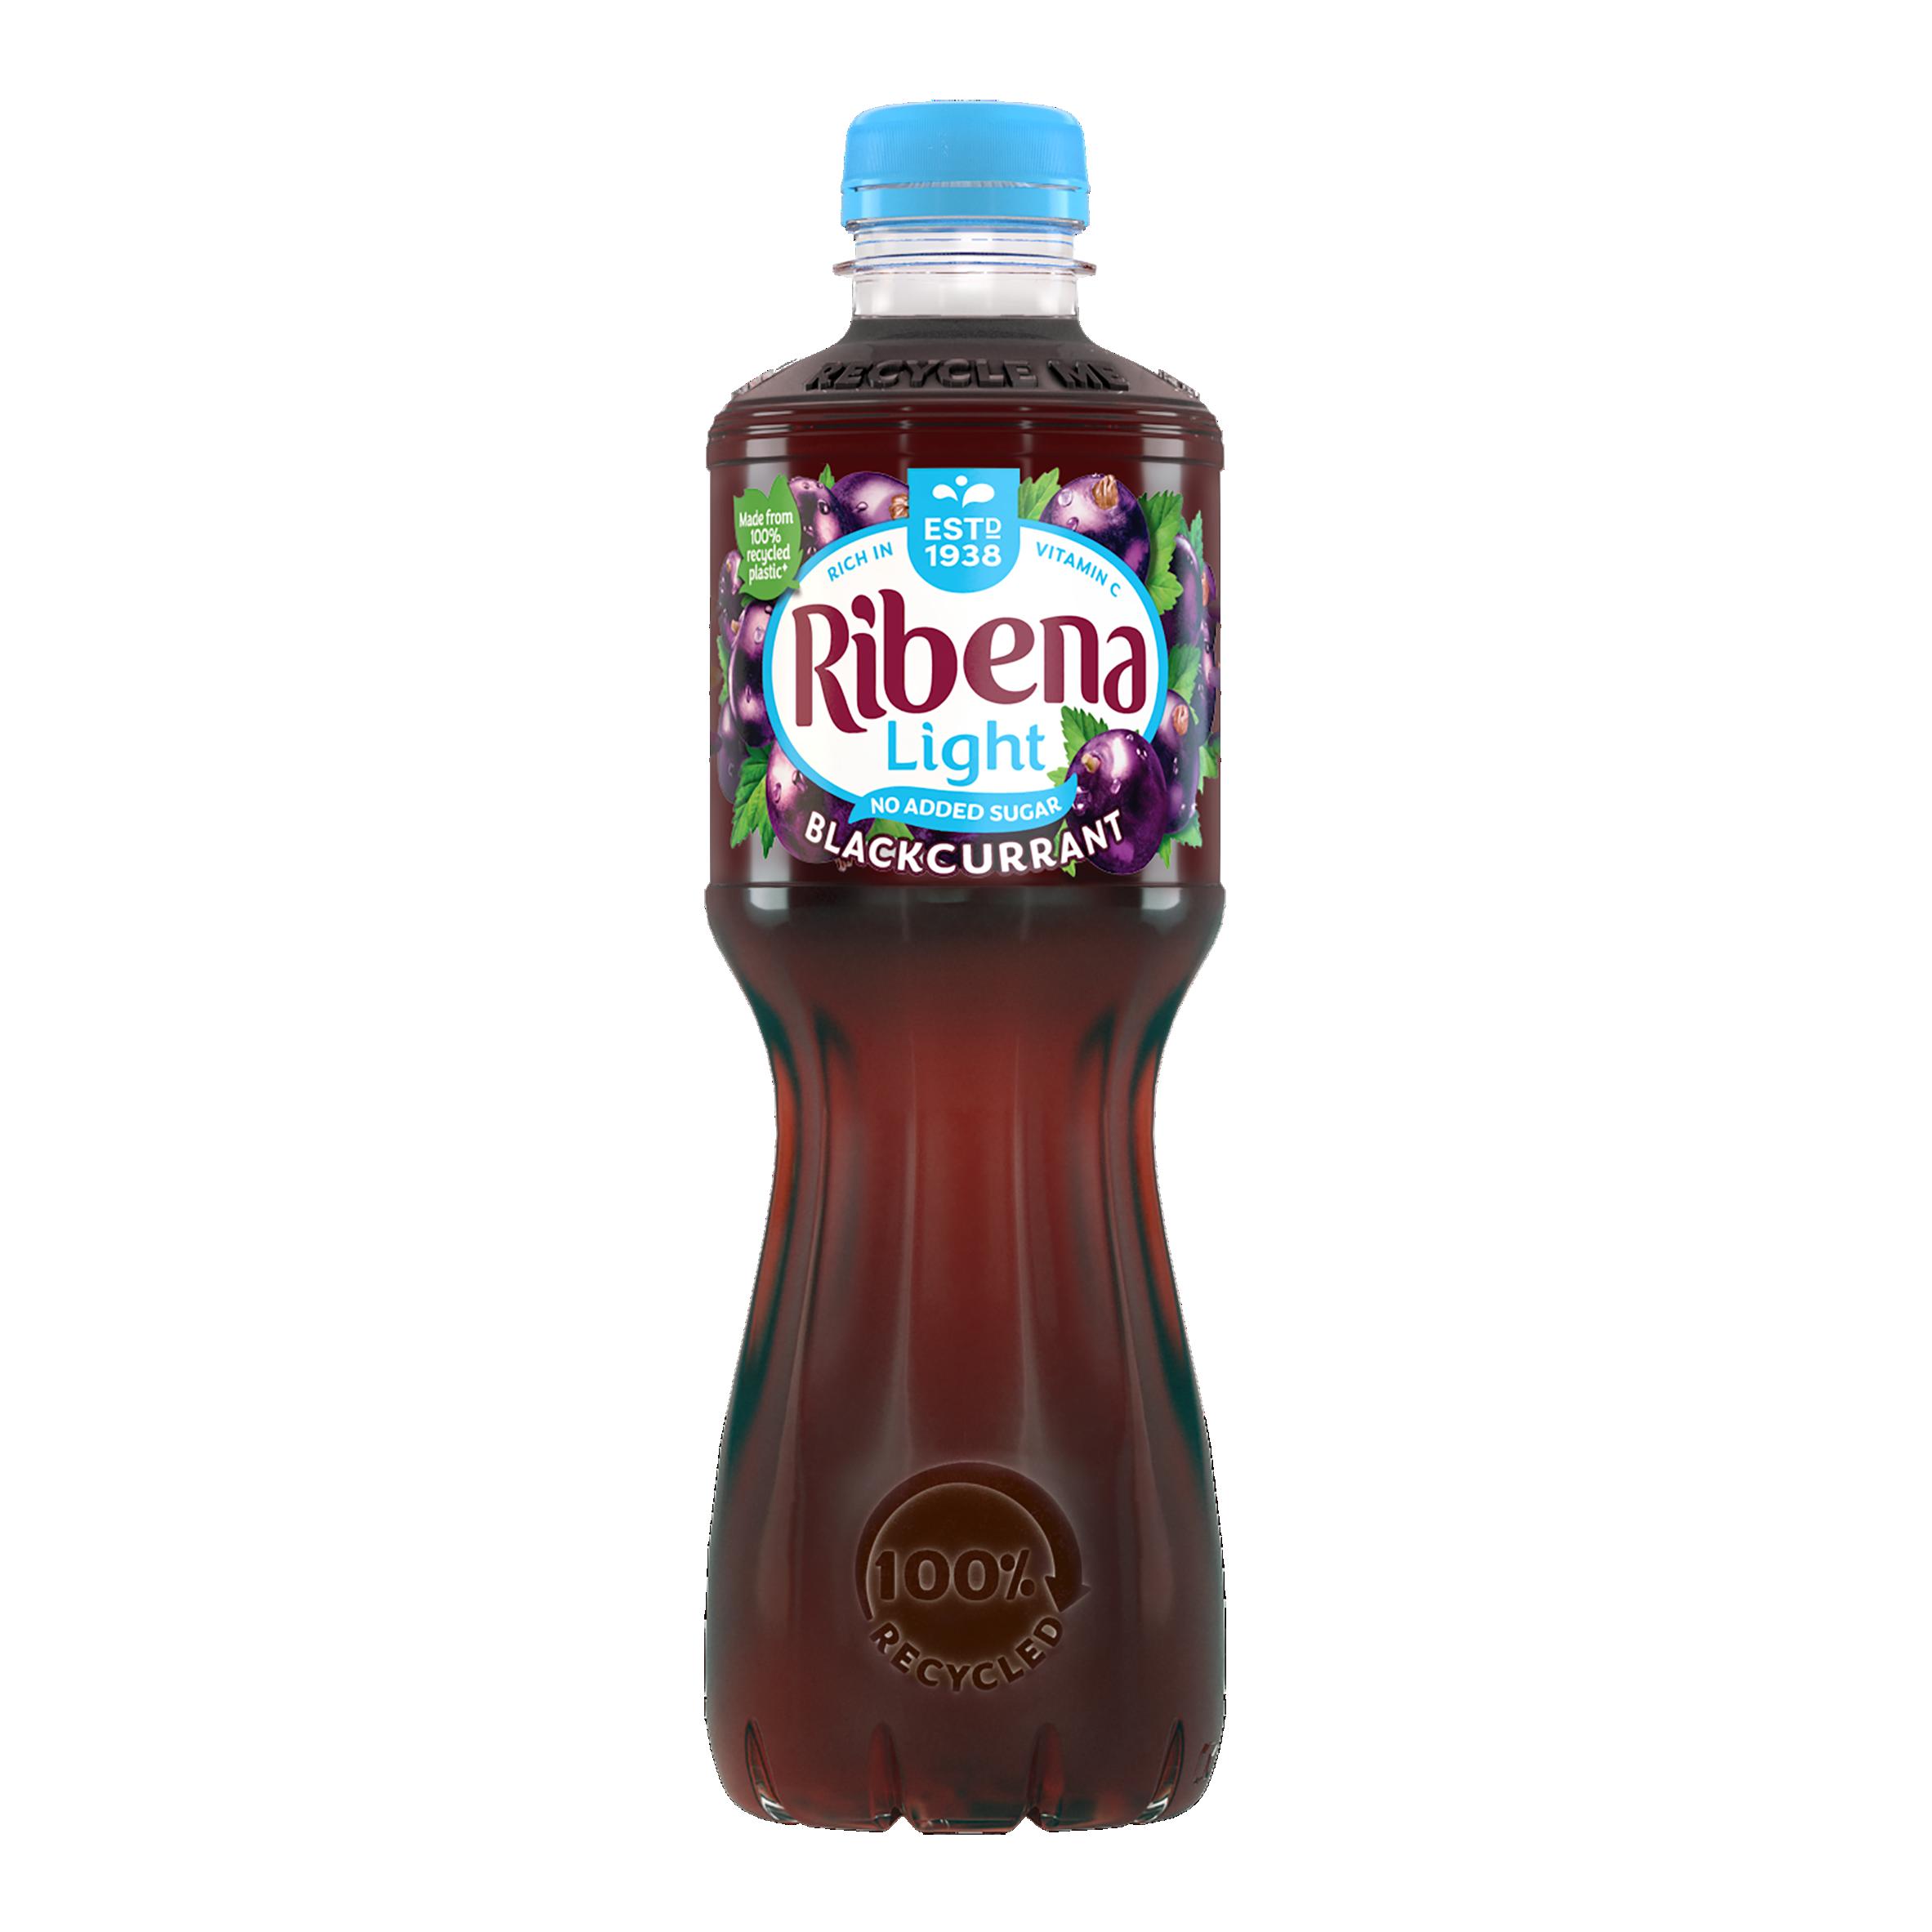 Ribena Blackcurrant Really Light 500Ml Bottle